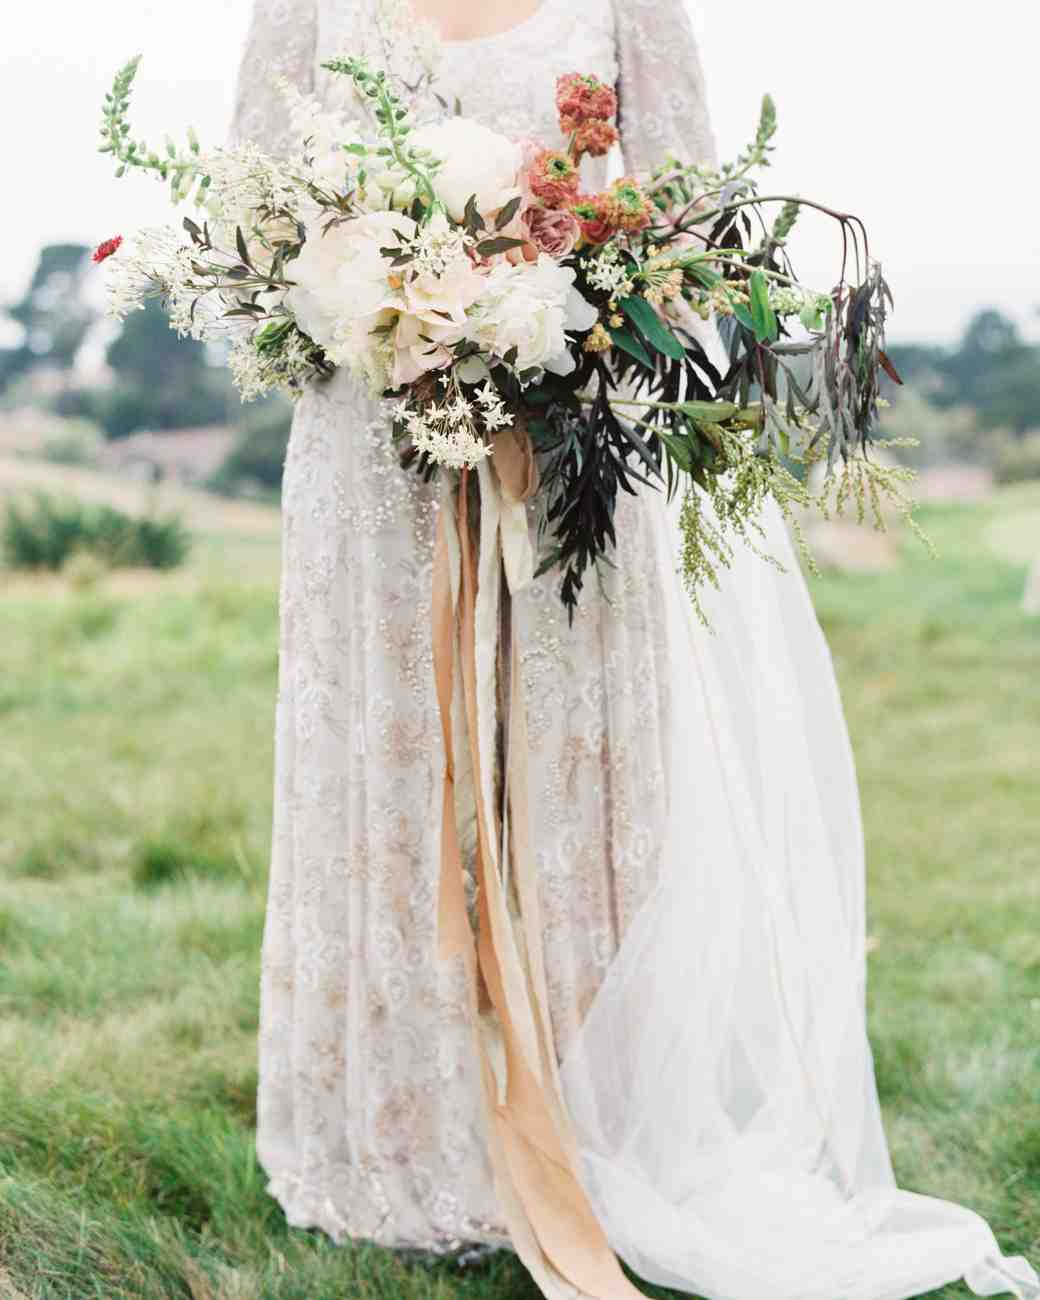 Boho-Chic Wedding Ideas For Free-Spirited Brides And